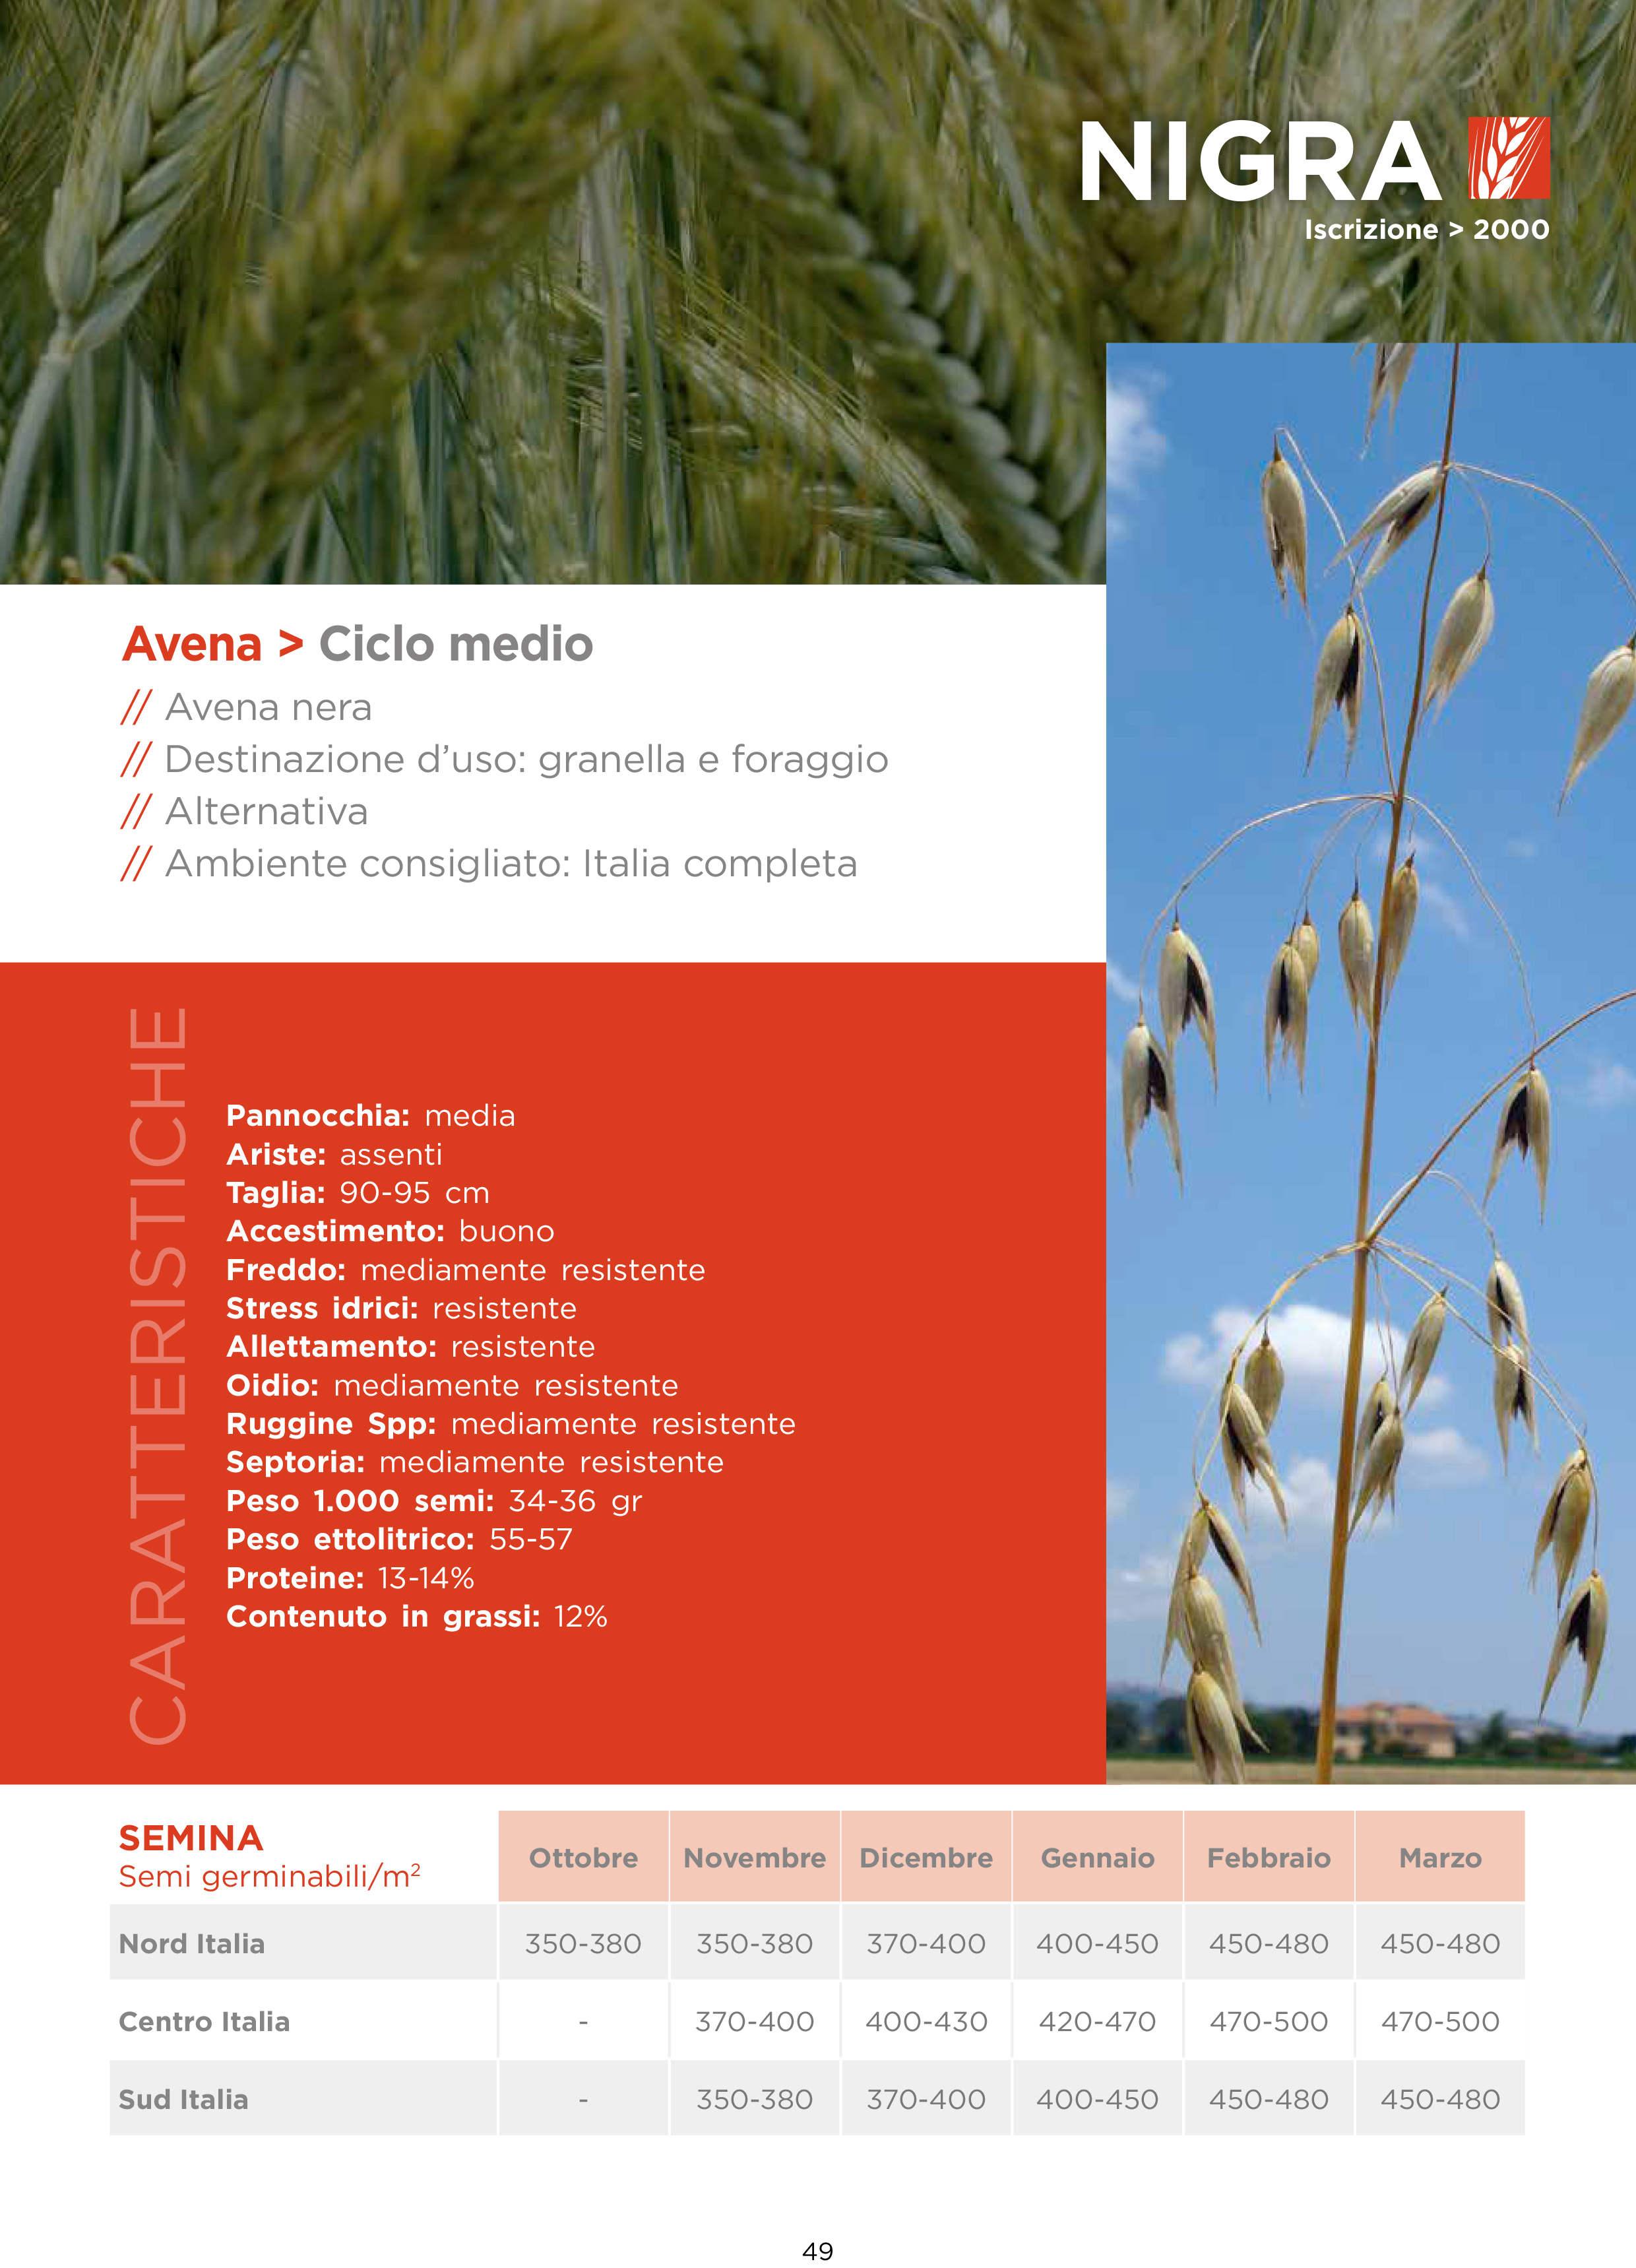 Avena-Nigra